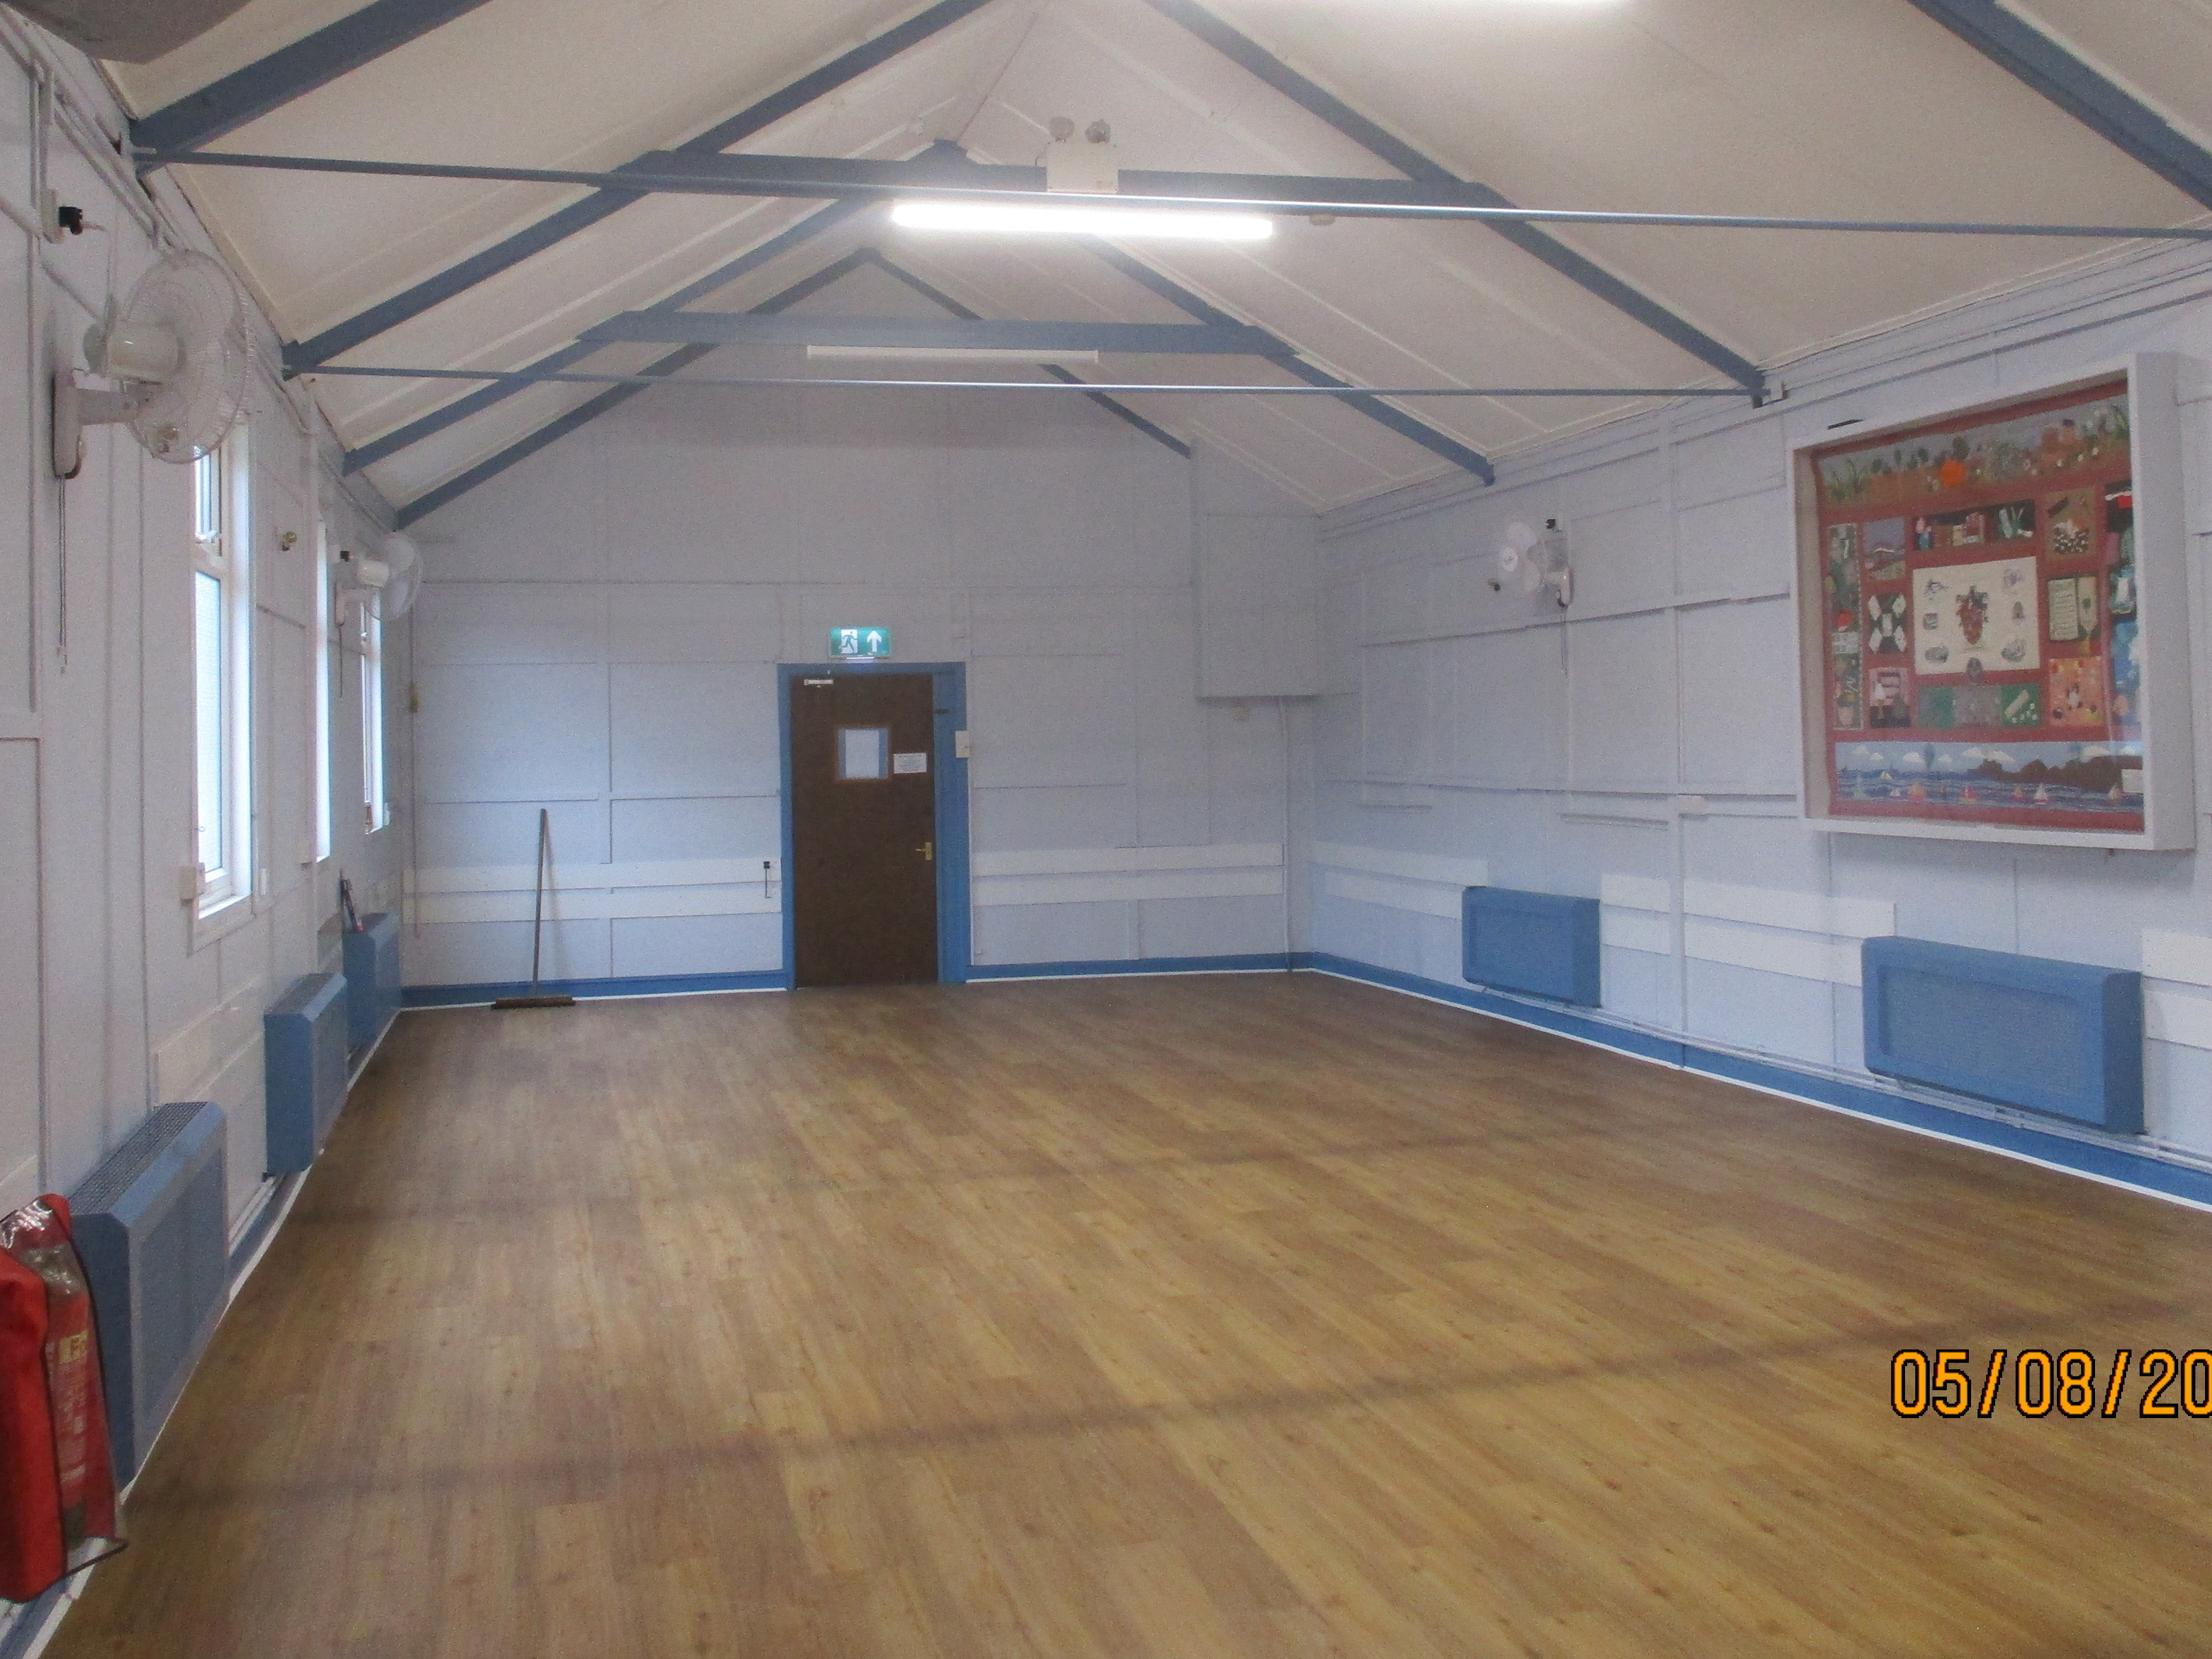 Main hall interior